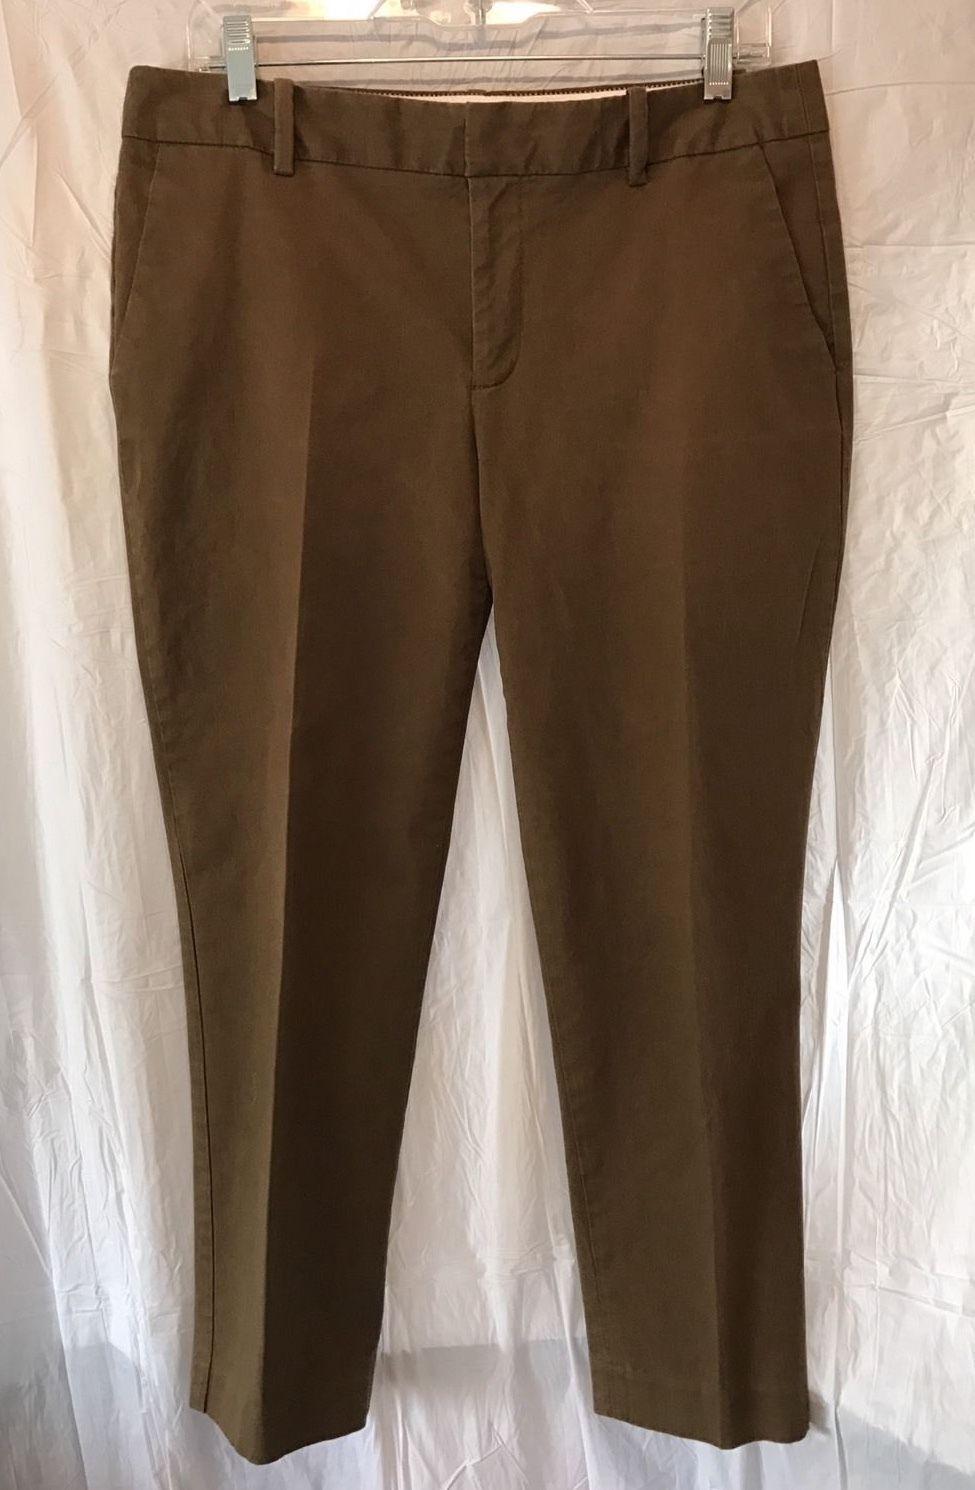 b6f247212 Eddie Bauer Womens Stretch Dress Pants Wear and 14 similar items. 57